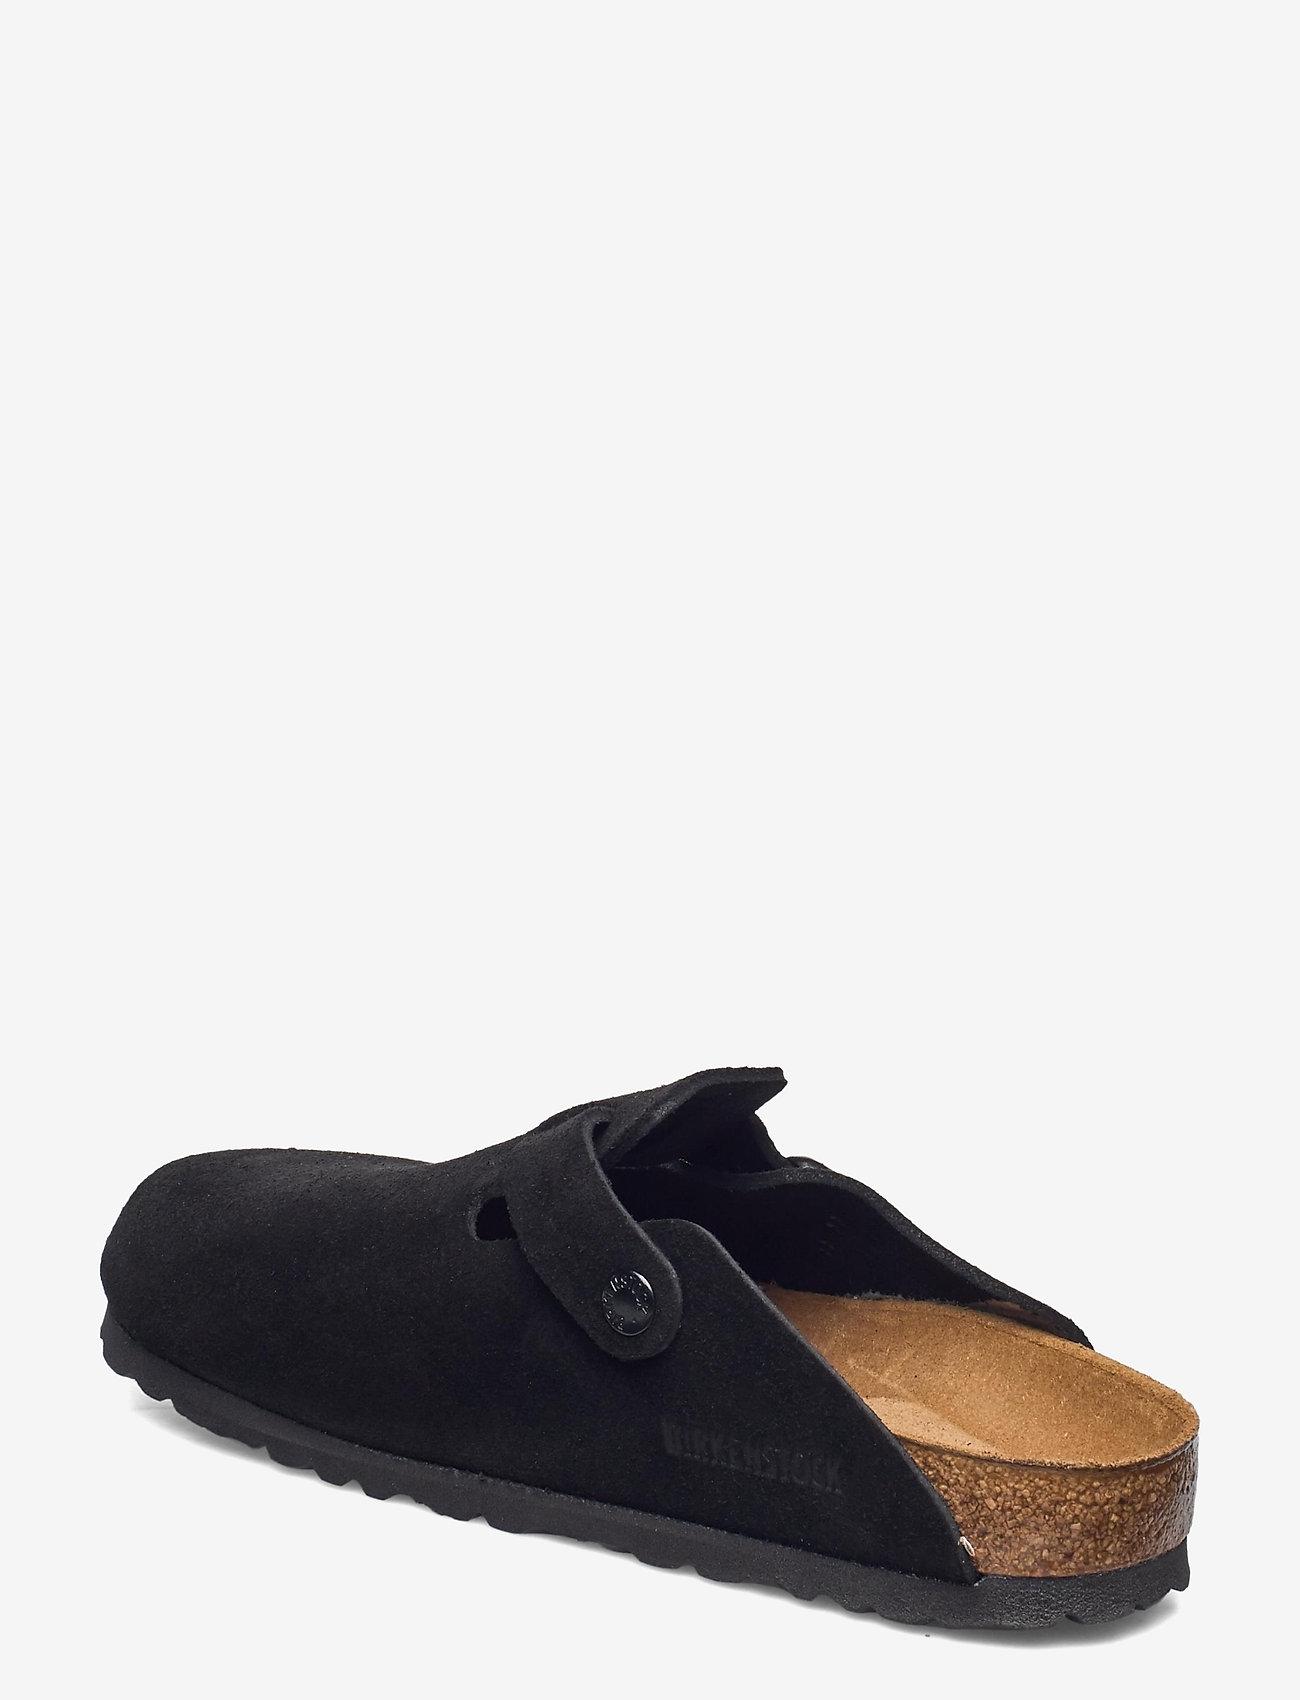 Birkenstock - Boston Soft Footbed - black - 2